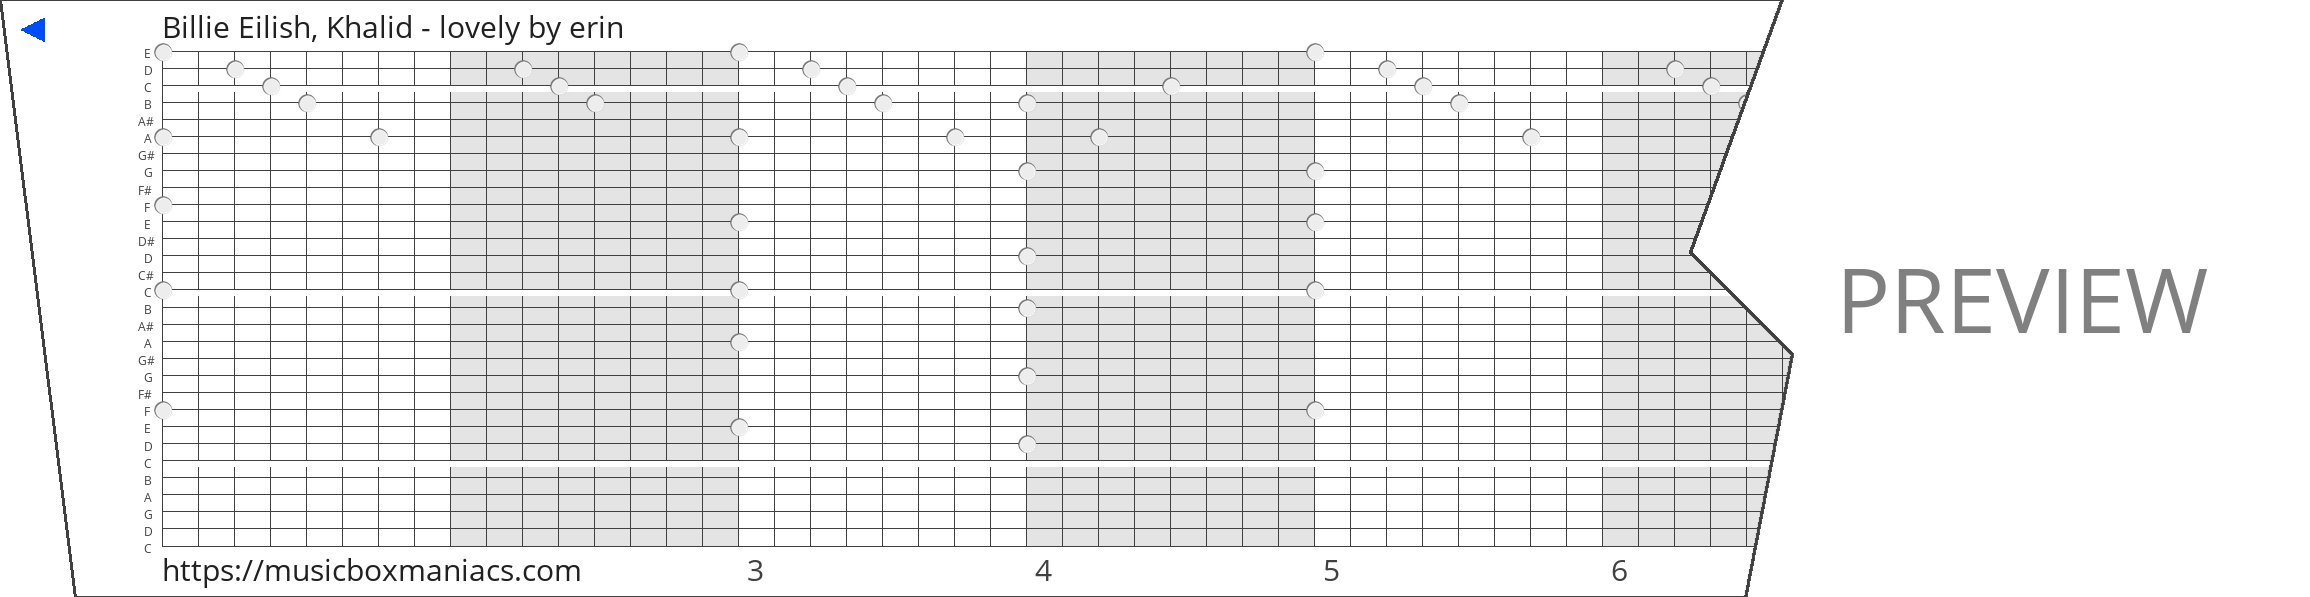 Billie Eilish, Khalid - lovely 30 note music box paper strip